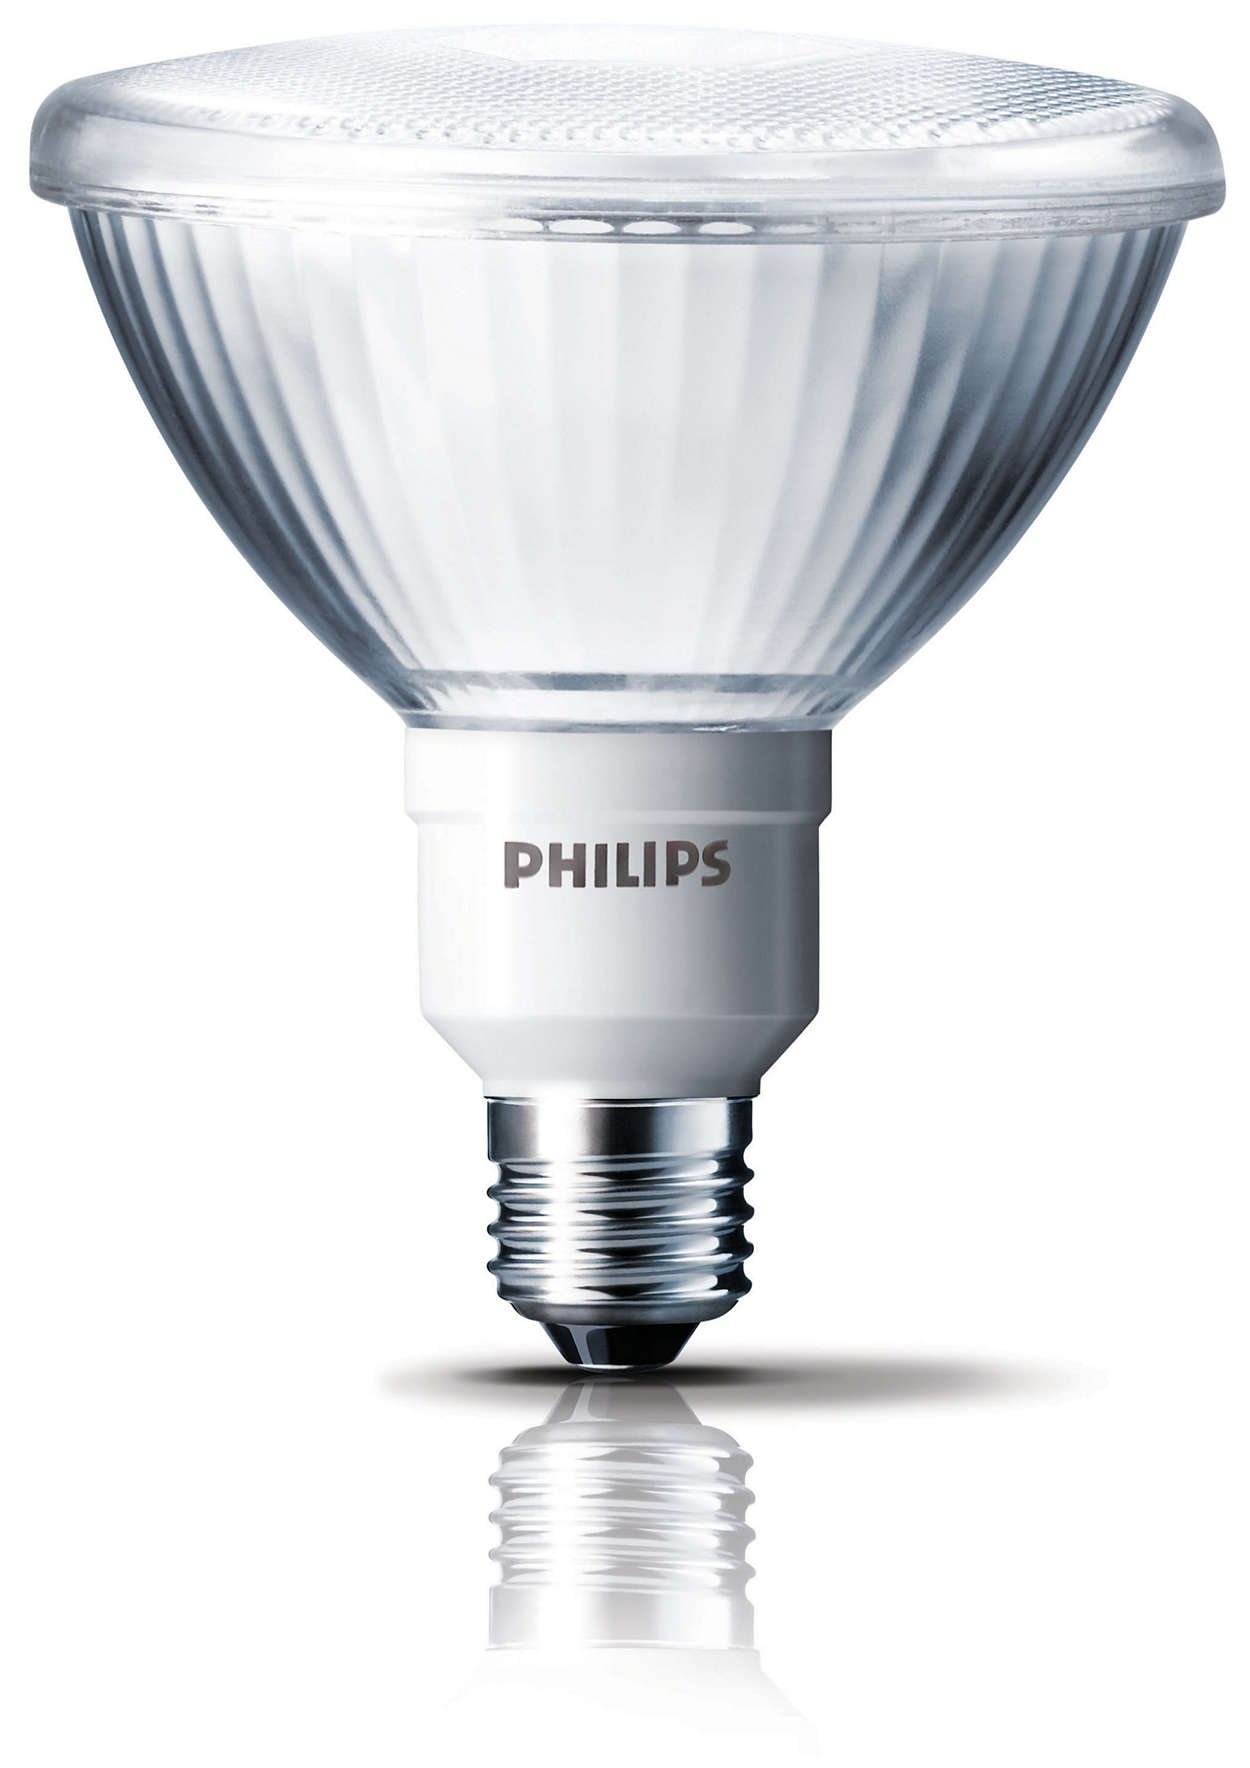 Energy-saving reflector with a focused light beam